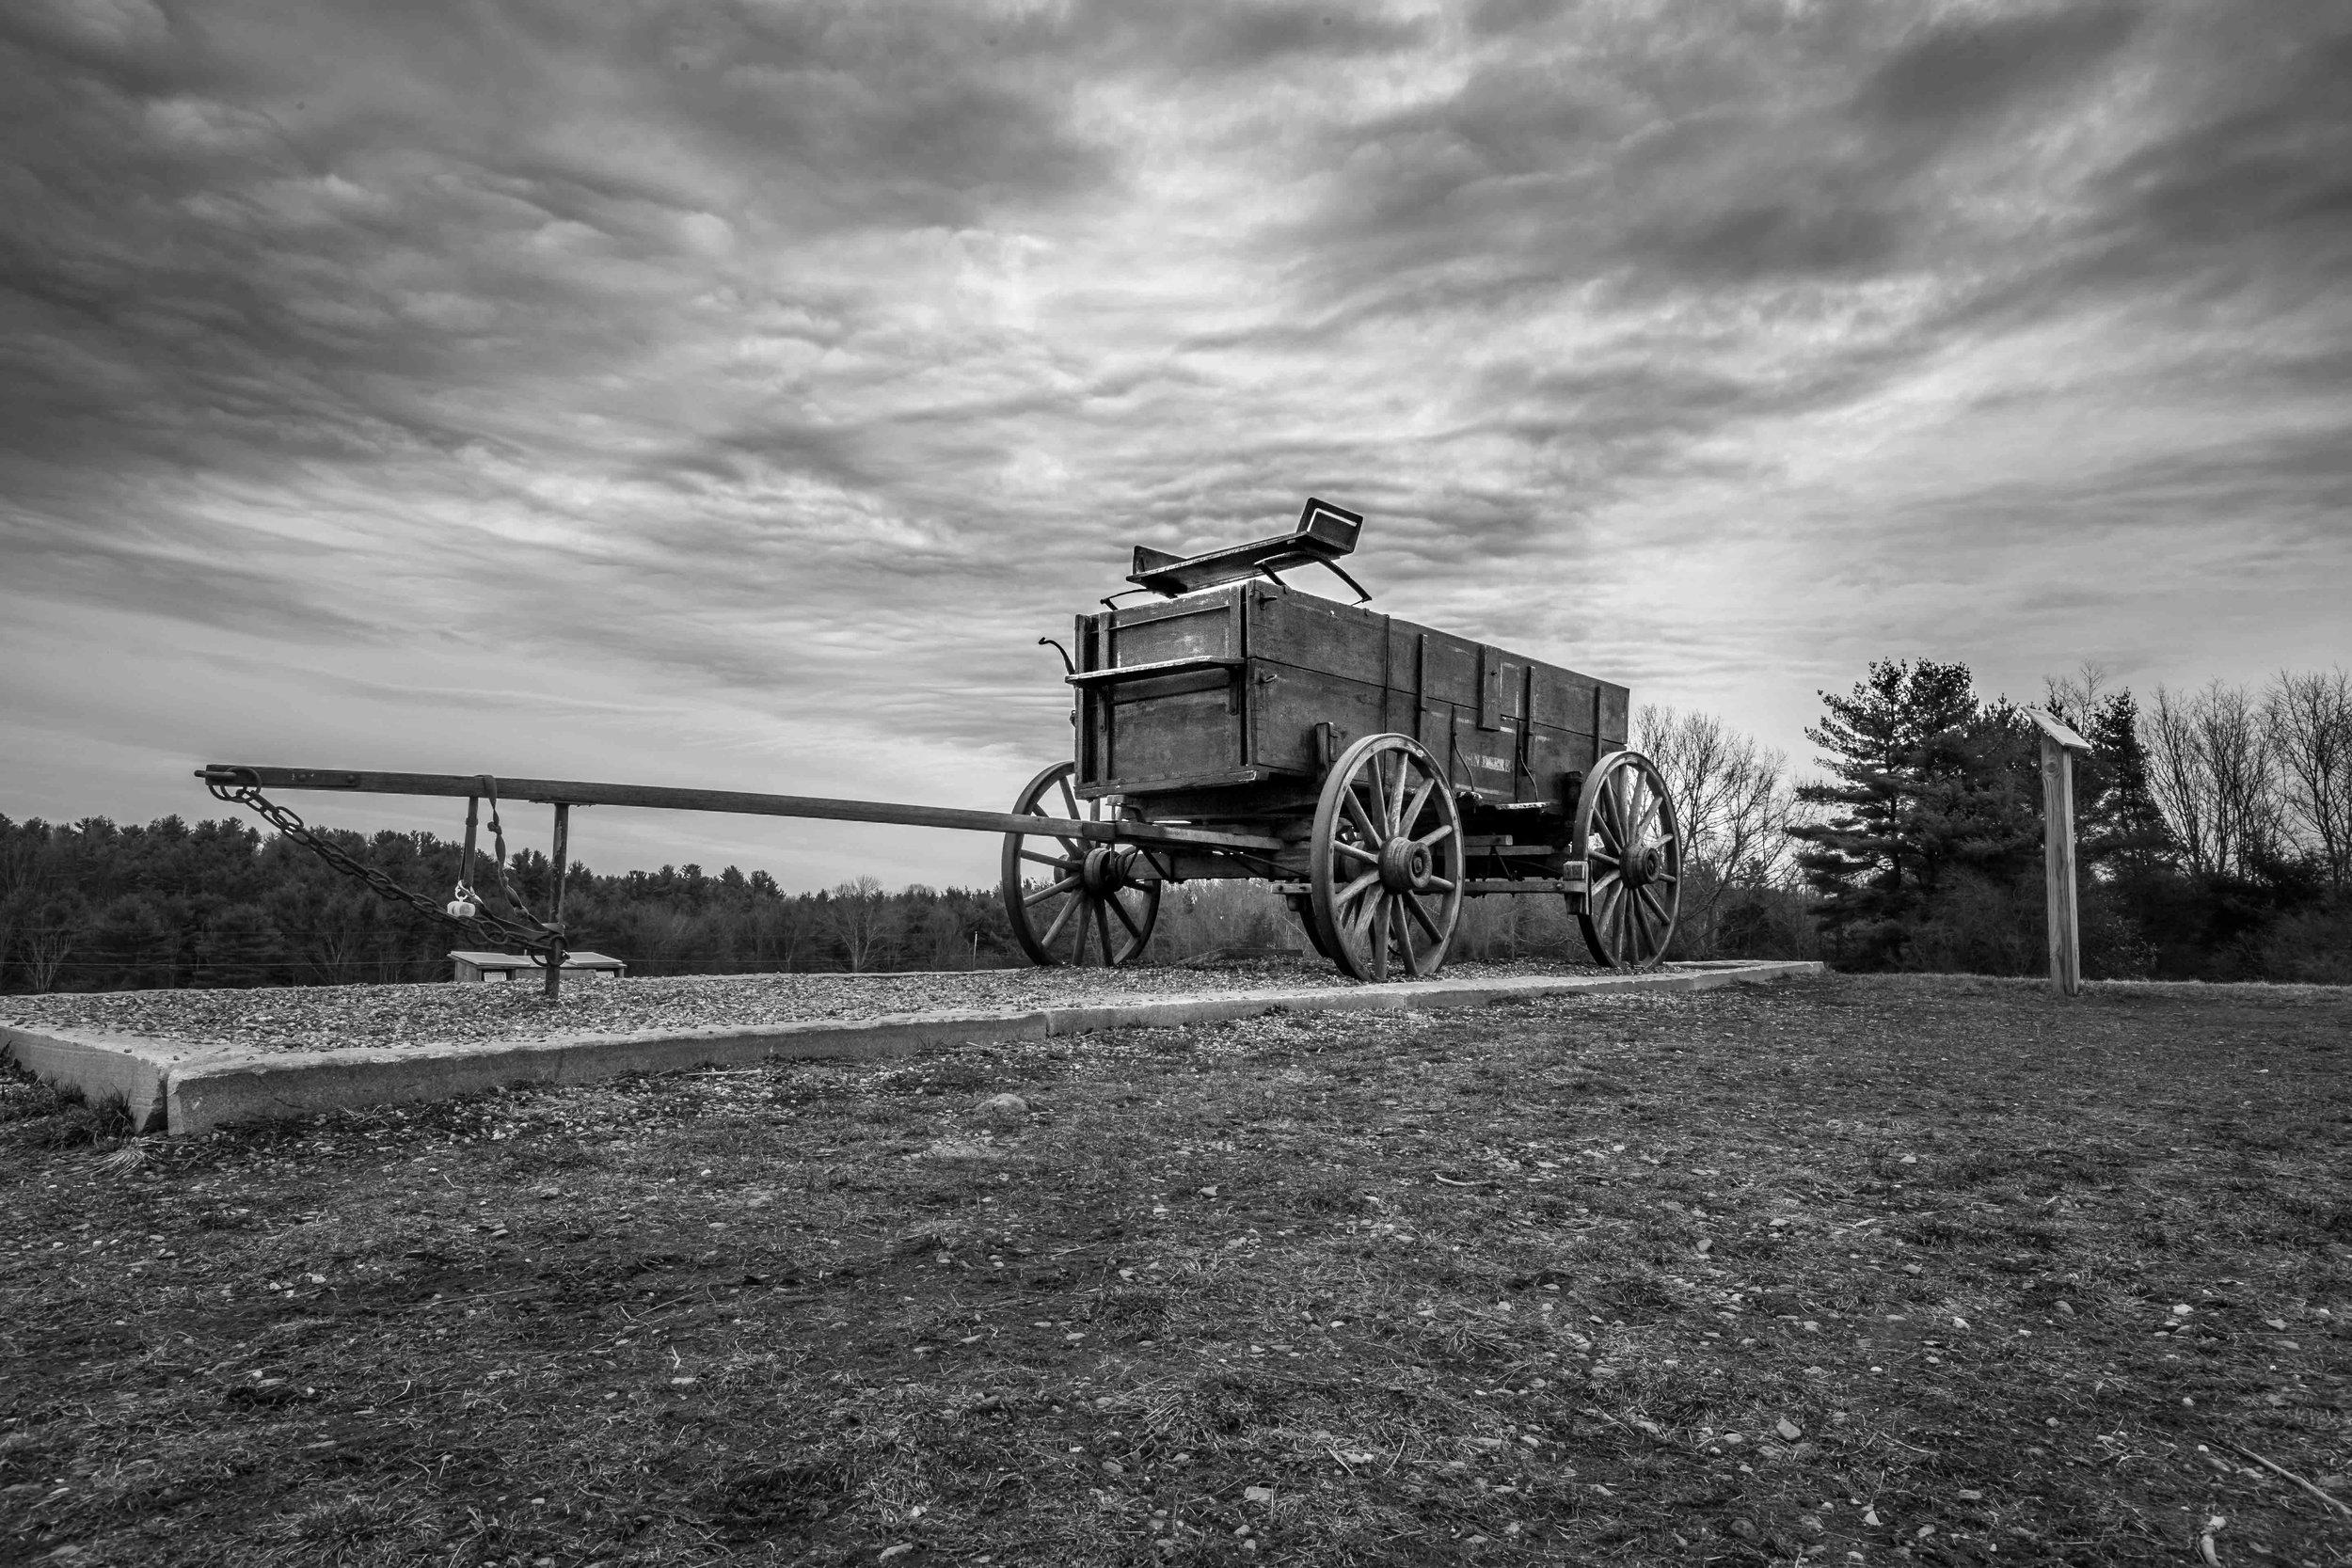 Durham Wagon Black & White 3.31.2018 ISO 100 - f18 - 1/8 sec